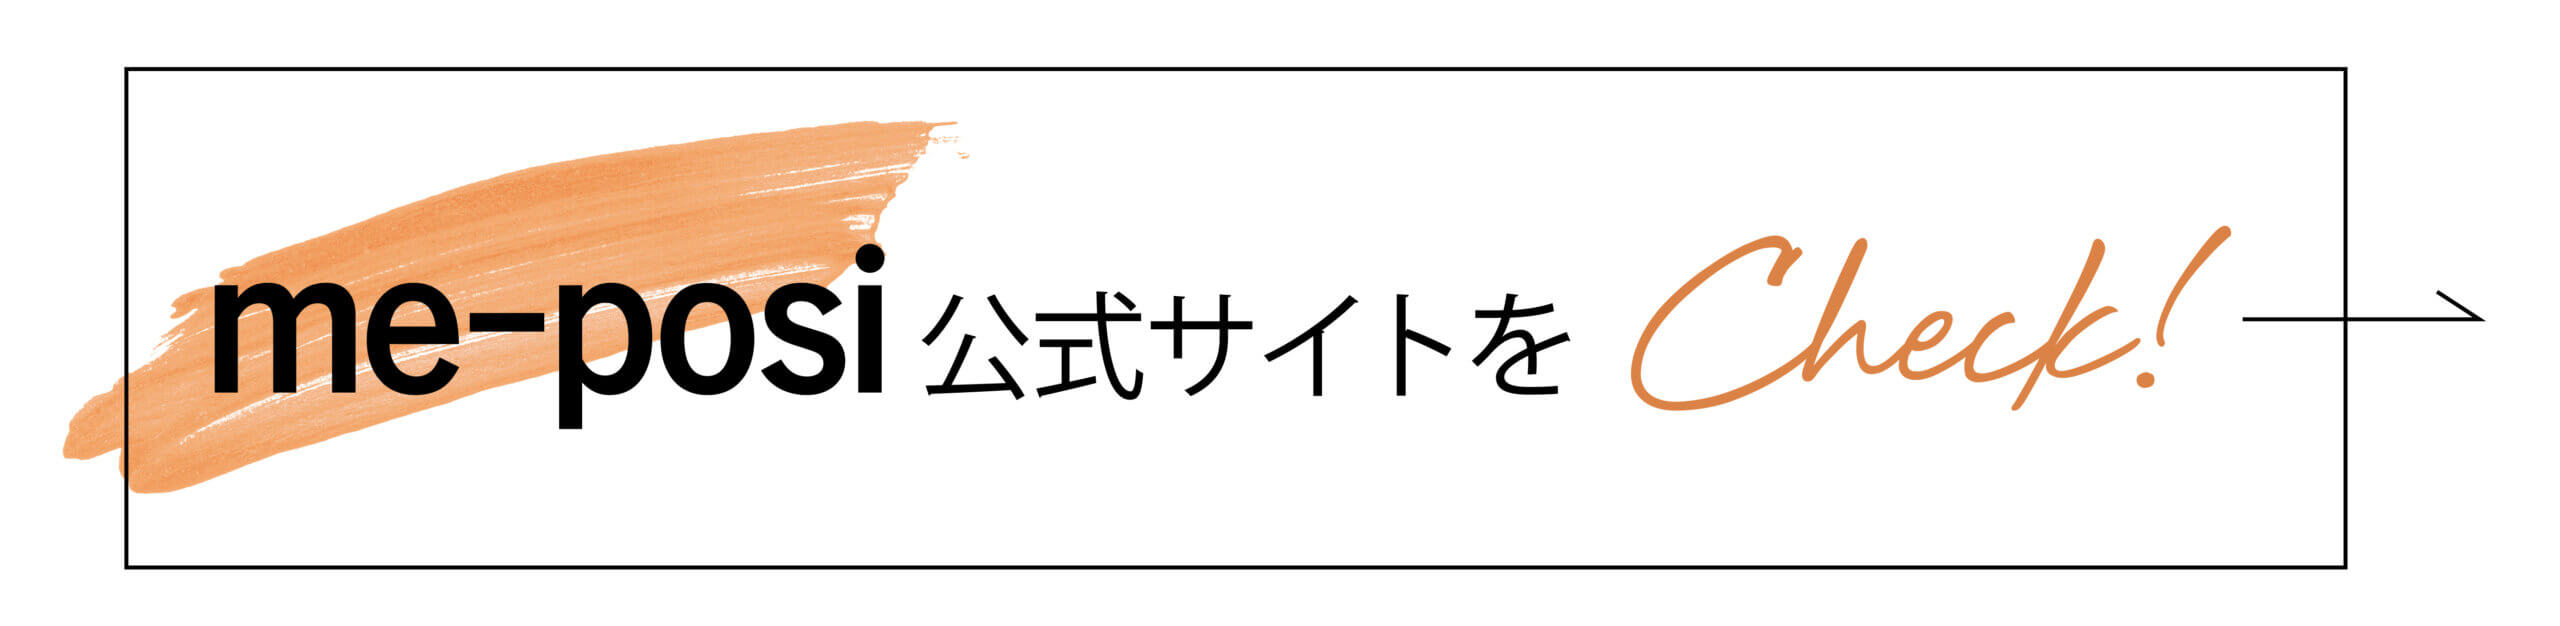 me-posi公式サイトをCheck!